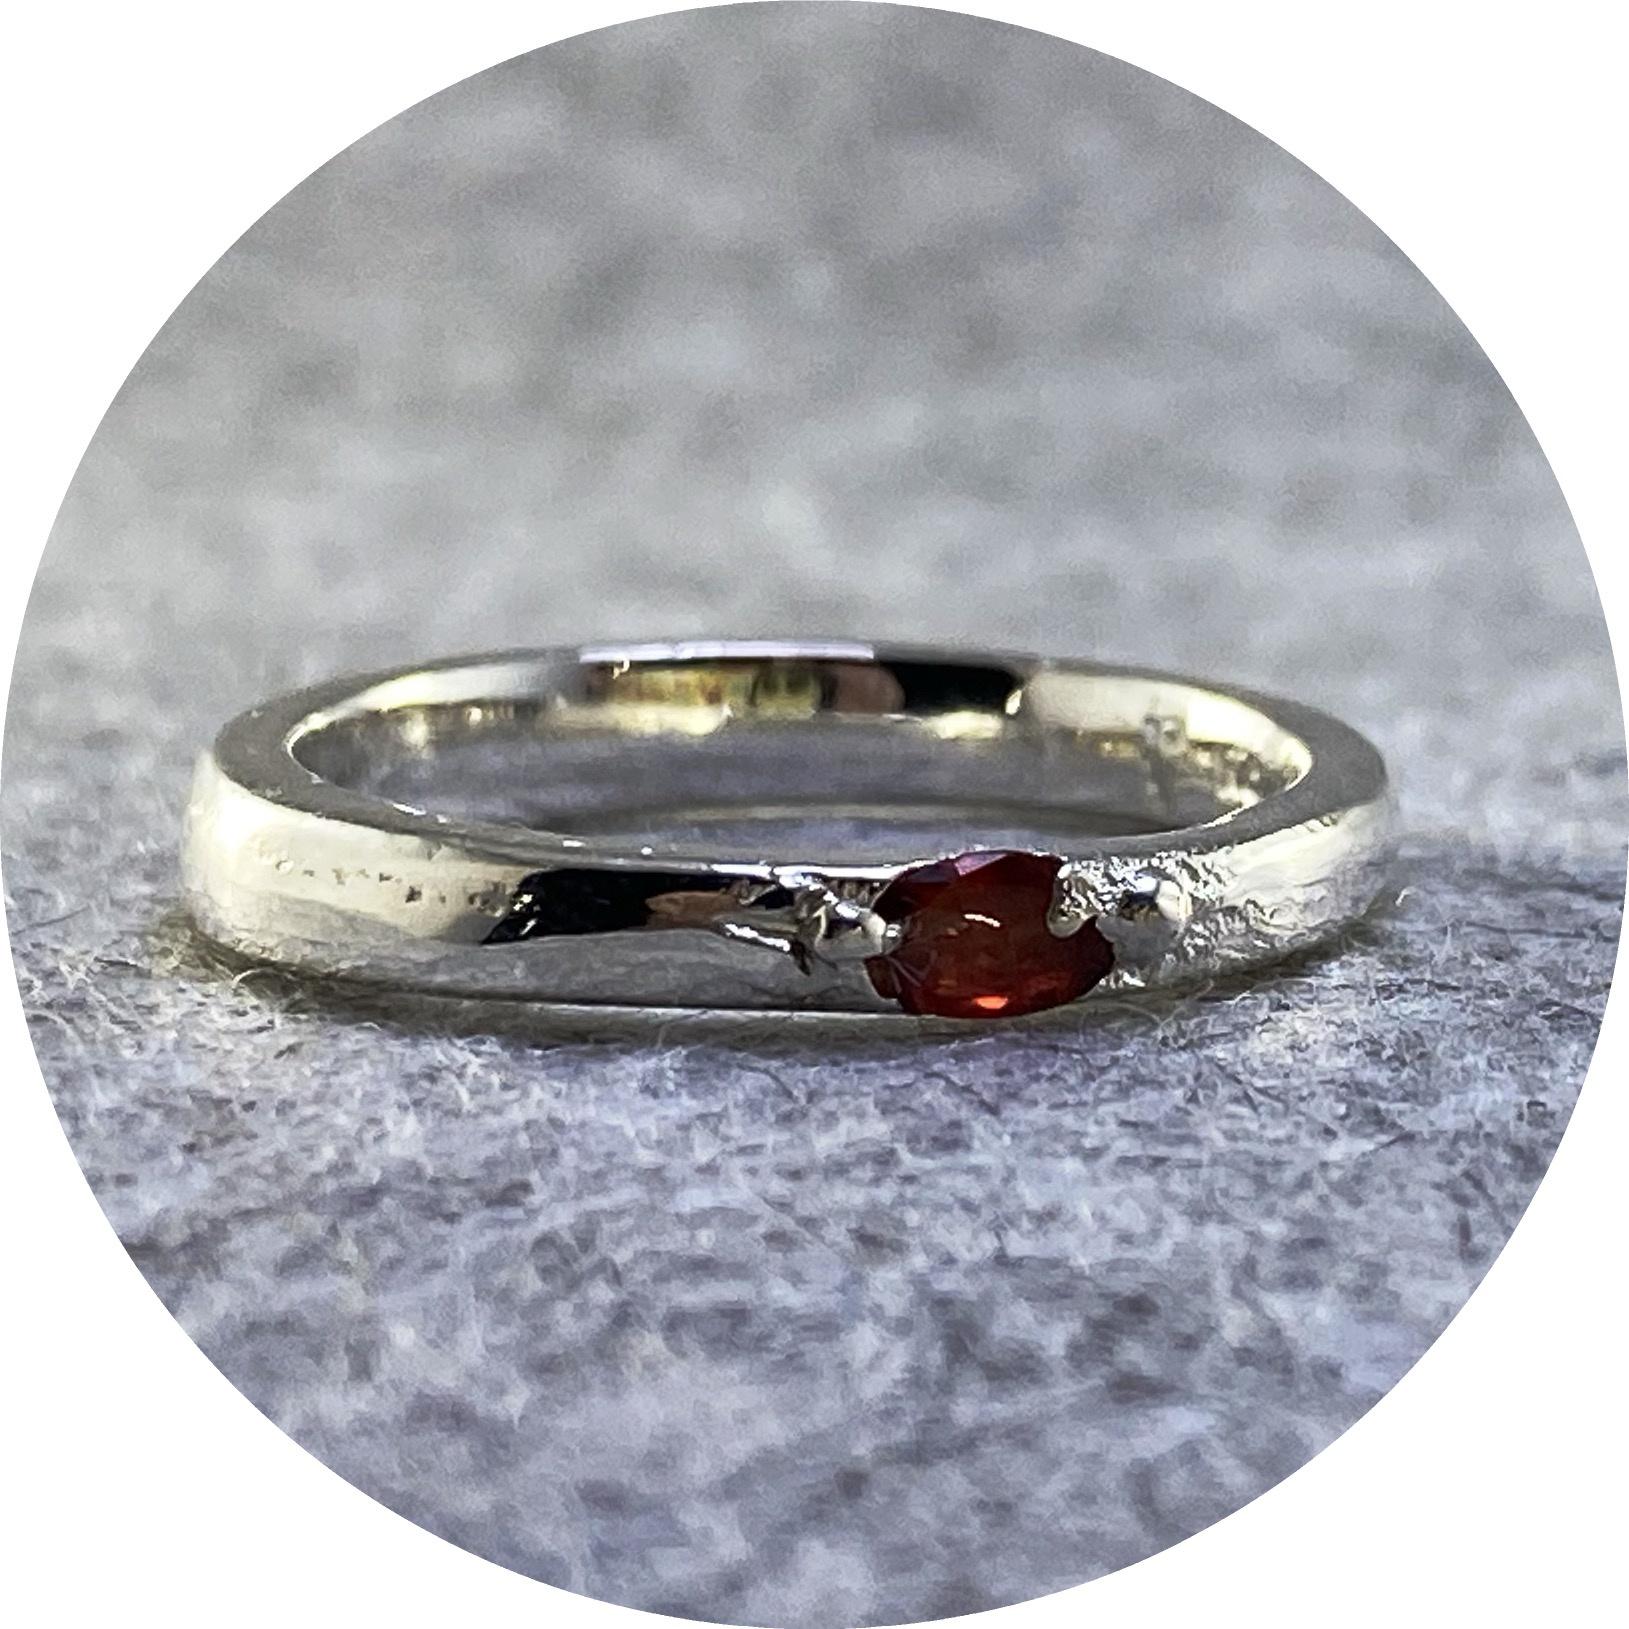 Kirra-Lea Caynes- Ruby ring cast in sterling silver. size N1/2